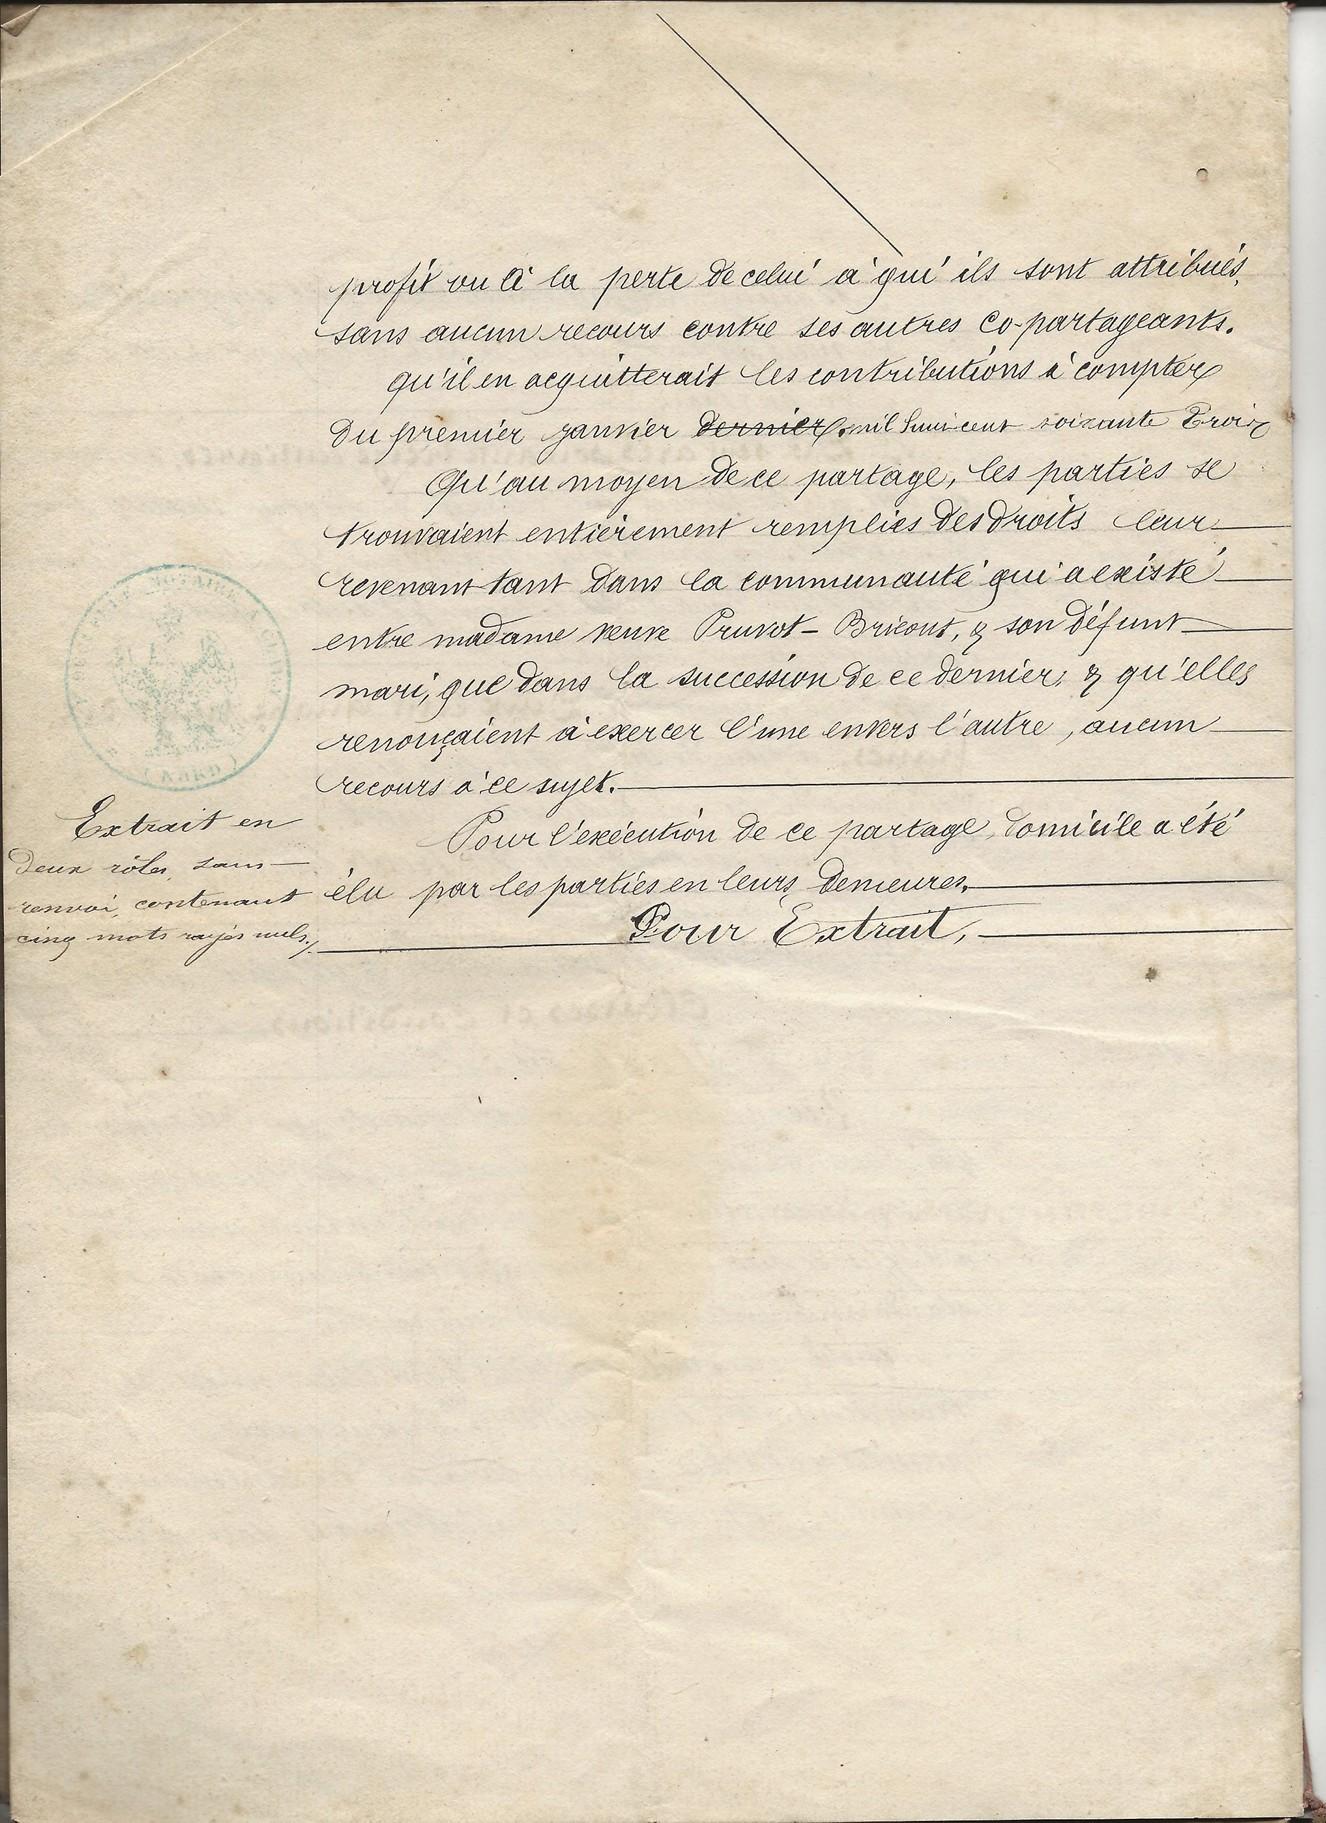 1863 partage ch bricout vve pruvot 004